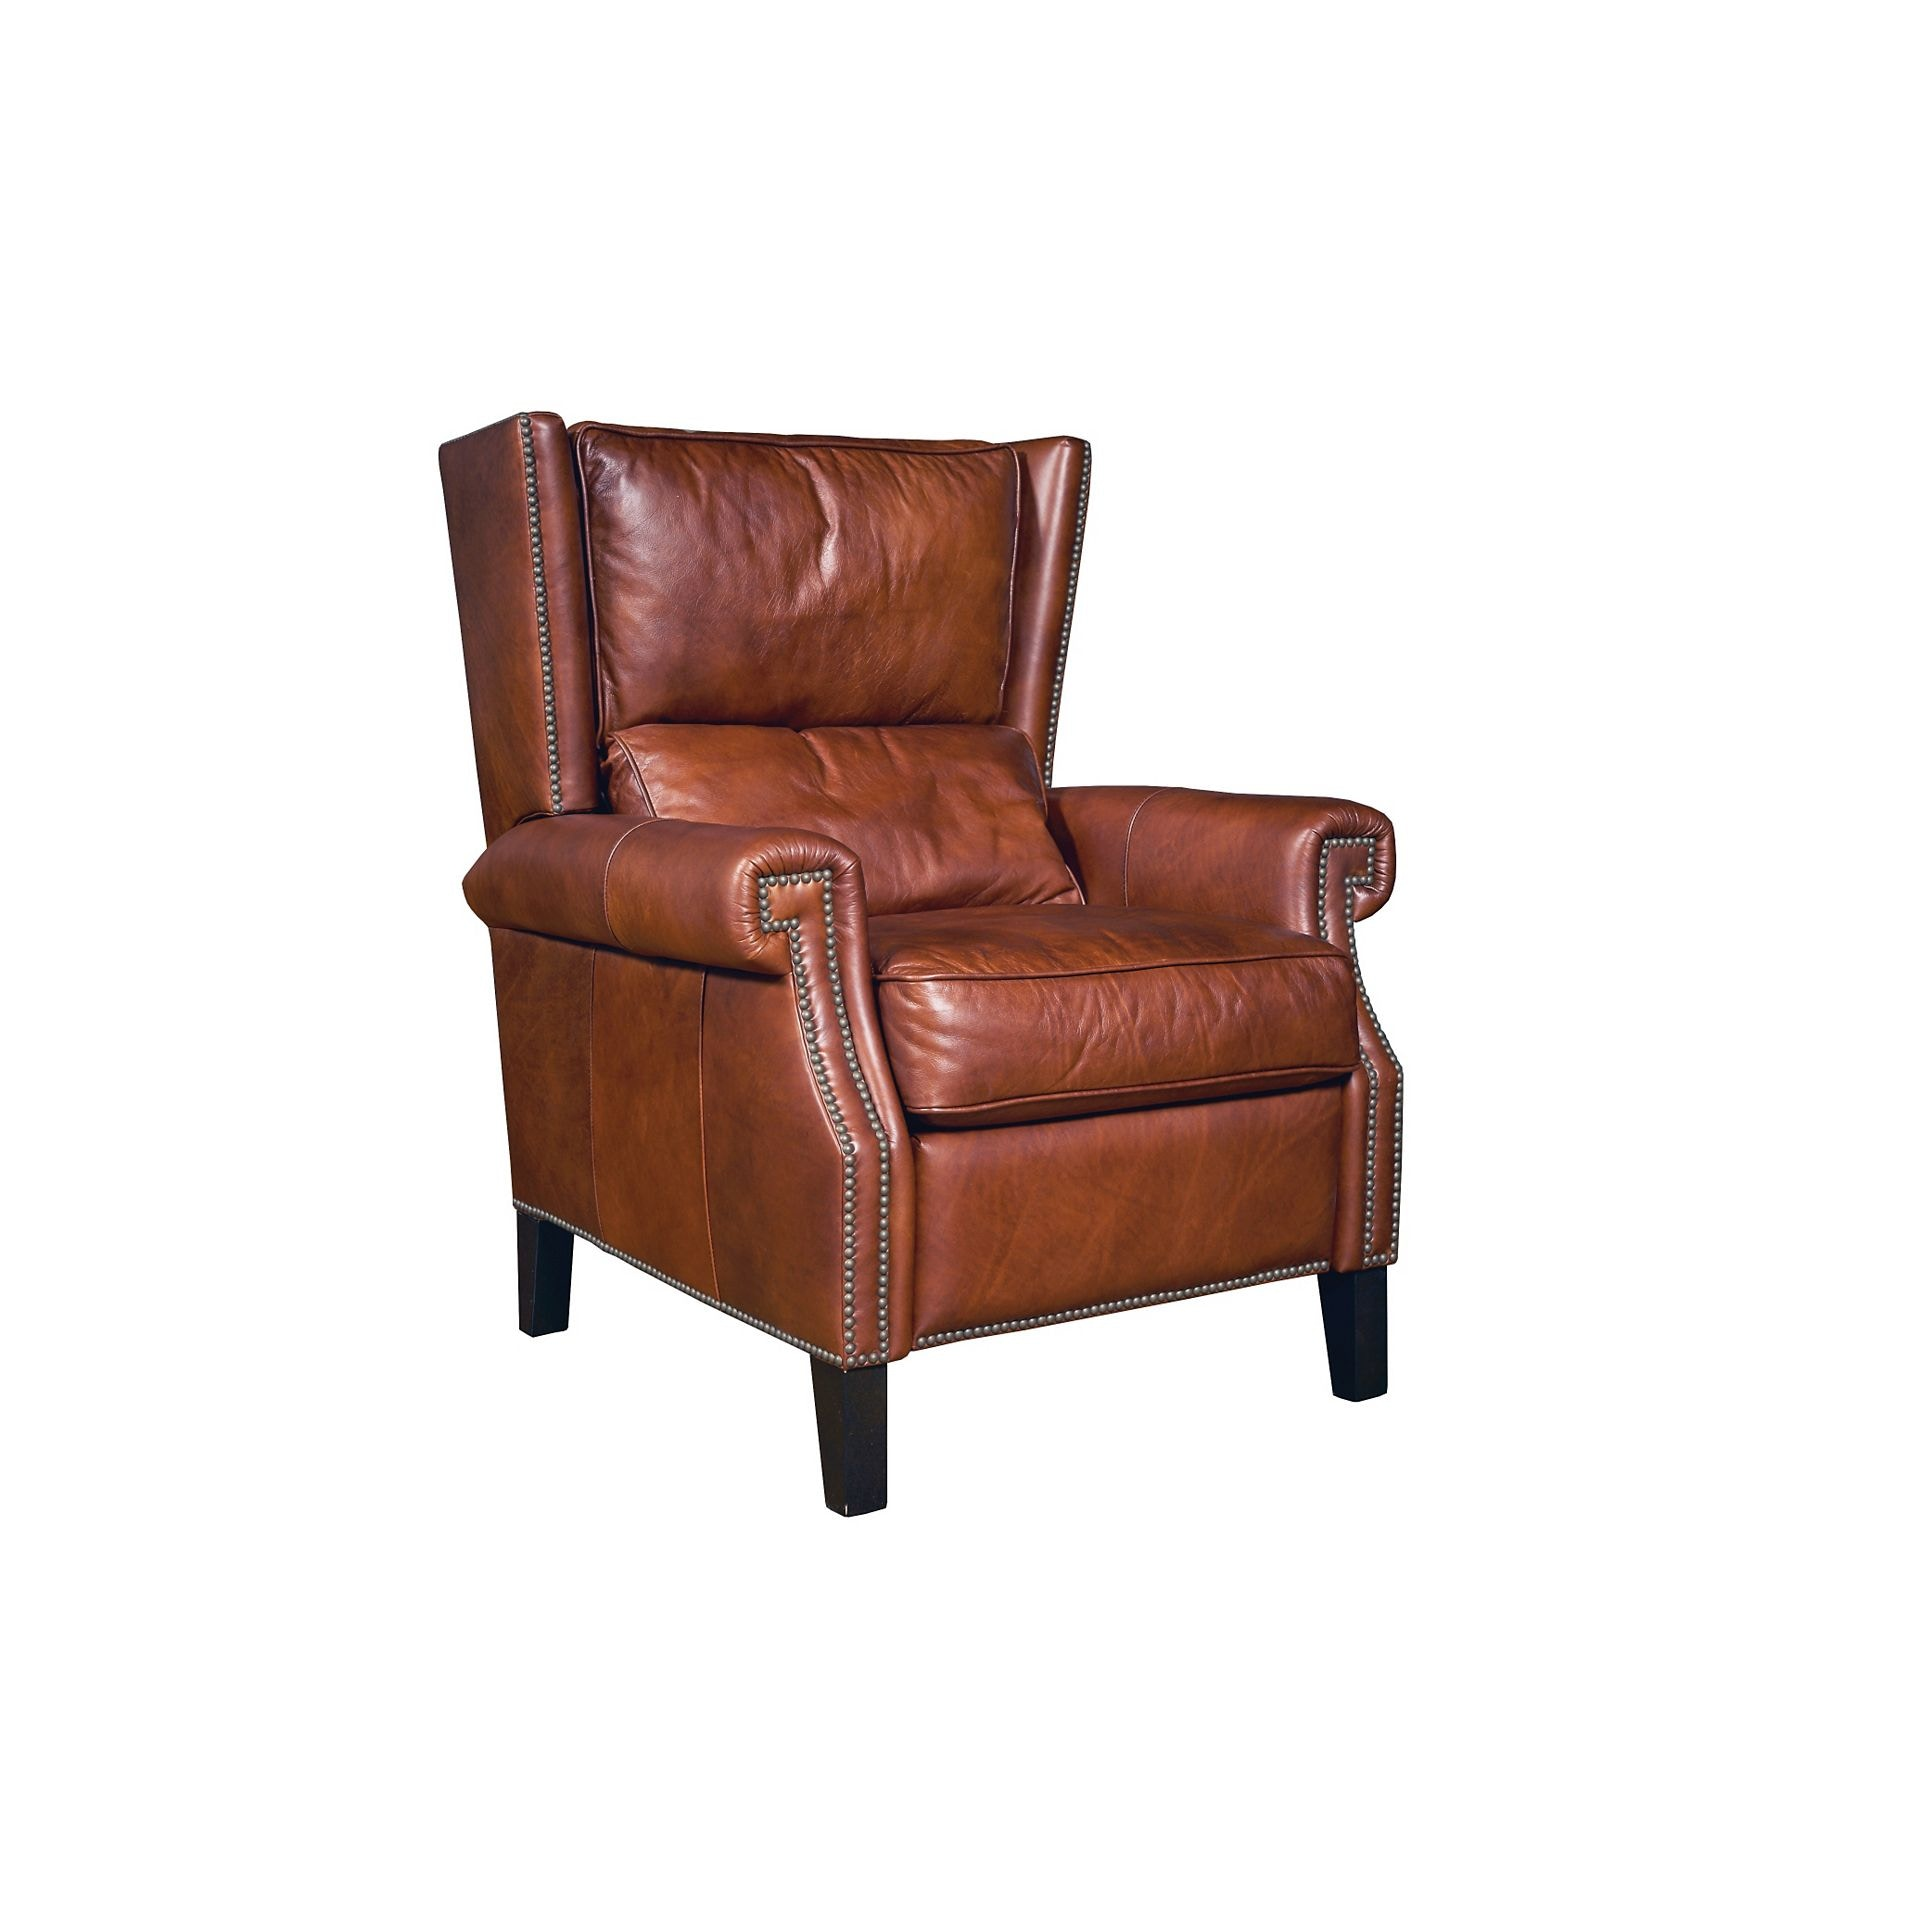 Superbe Henredon Furniture Henredon Leather Company Aidan Recliner IL8873 RE